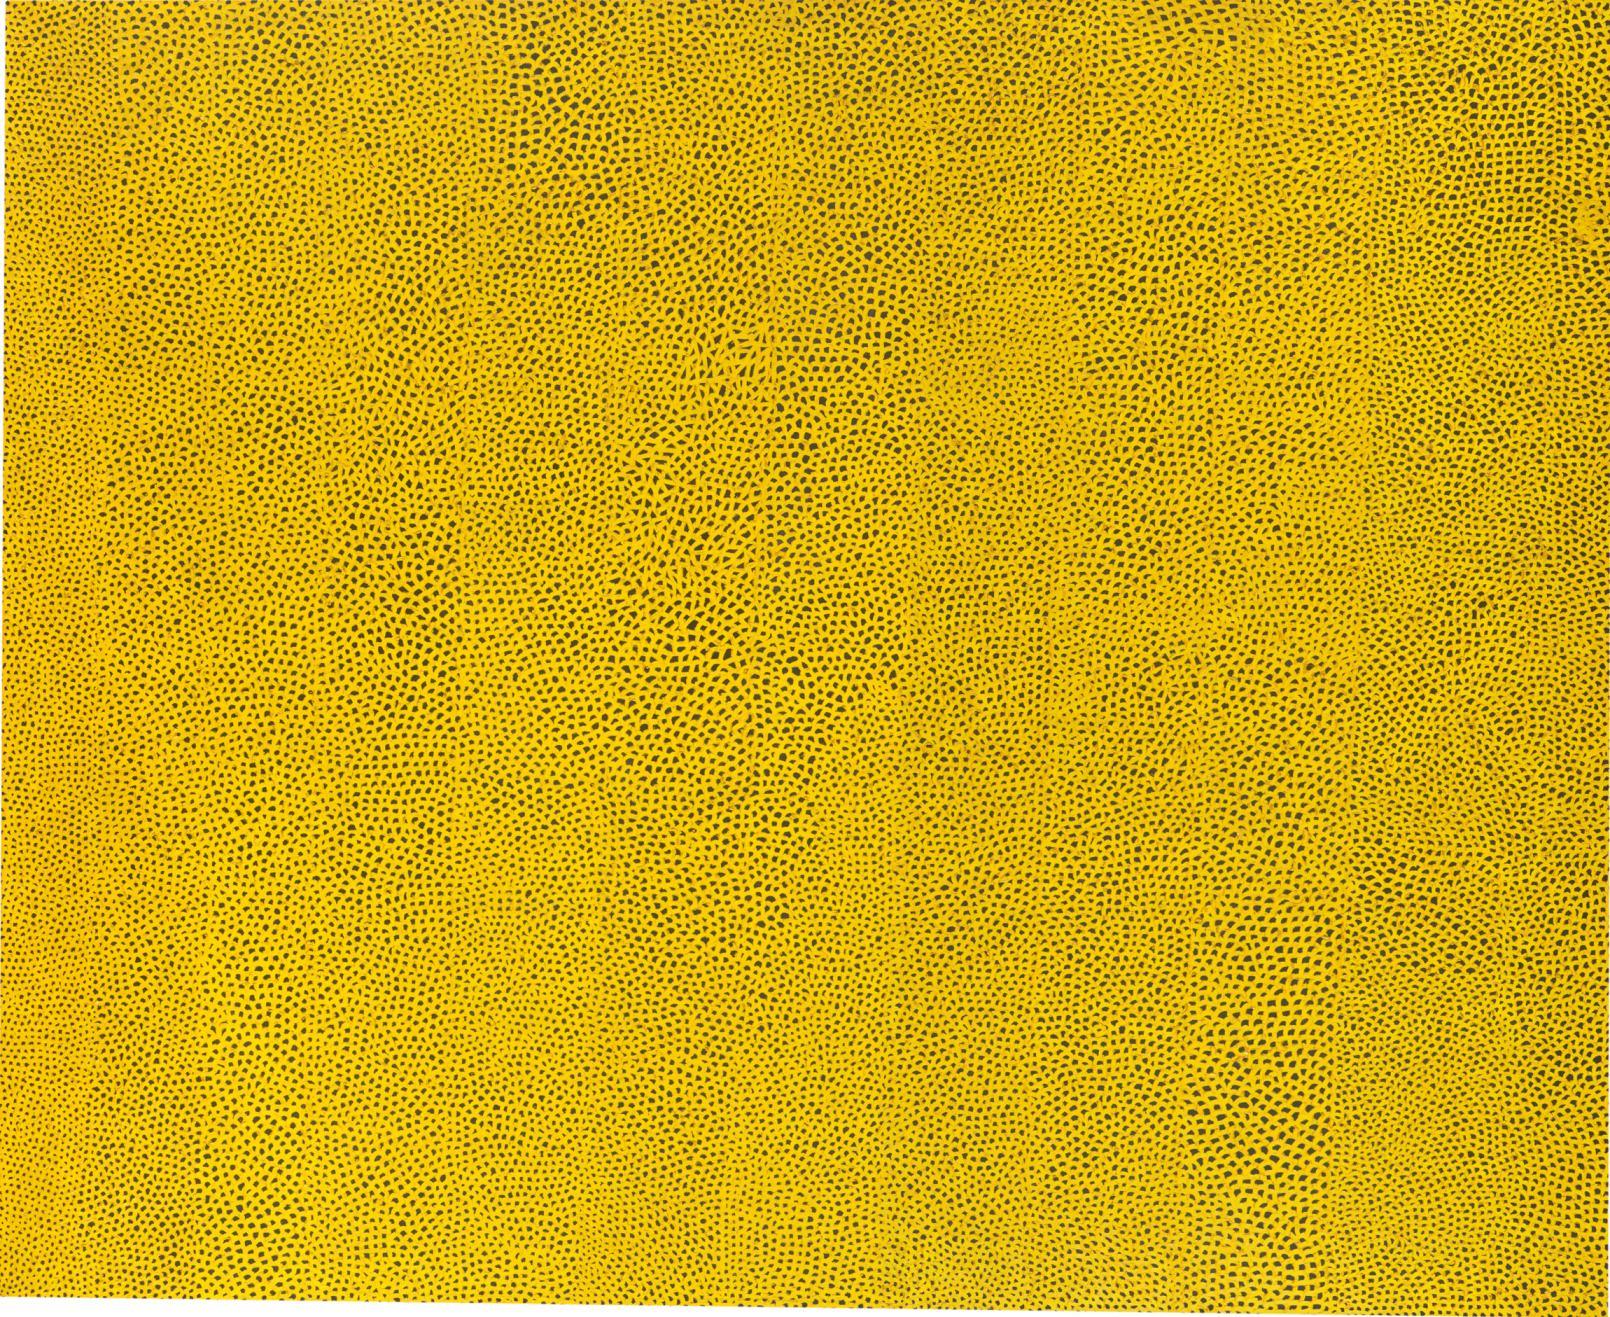 Yayoi Kusama   Infinity Nets Yellow , 1960 (Oil paint on canvas) National Gallery of Art, Washington. Gift of the Collectors Committee (2002.37.1). © Yayoi Kusama